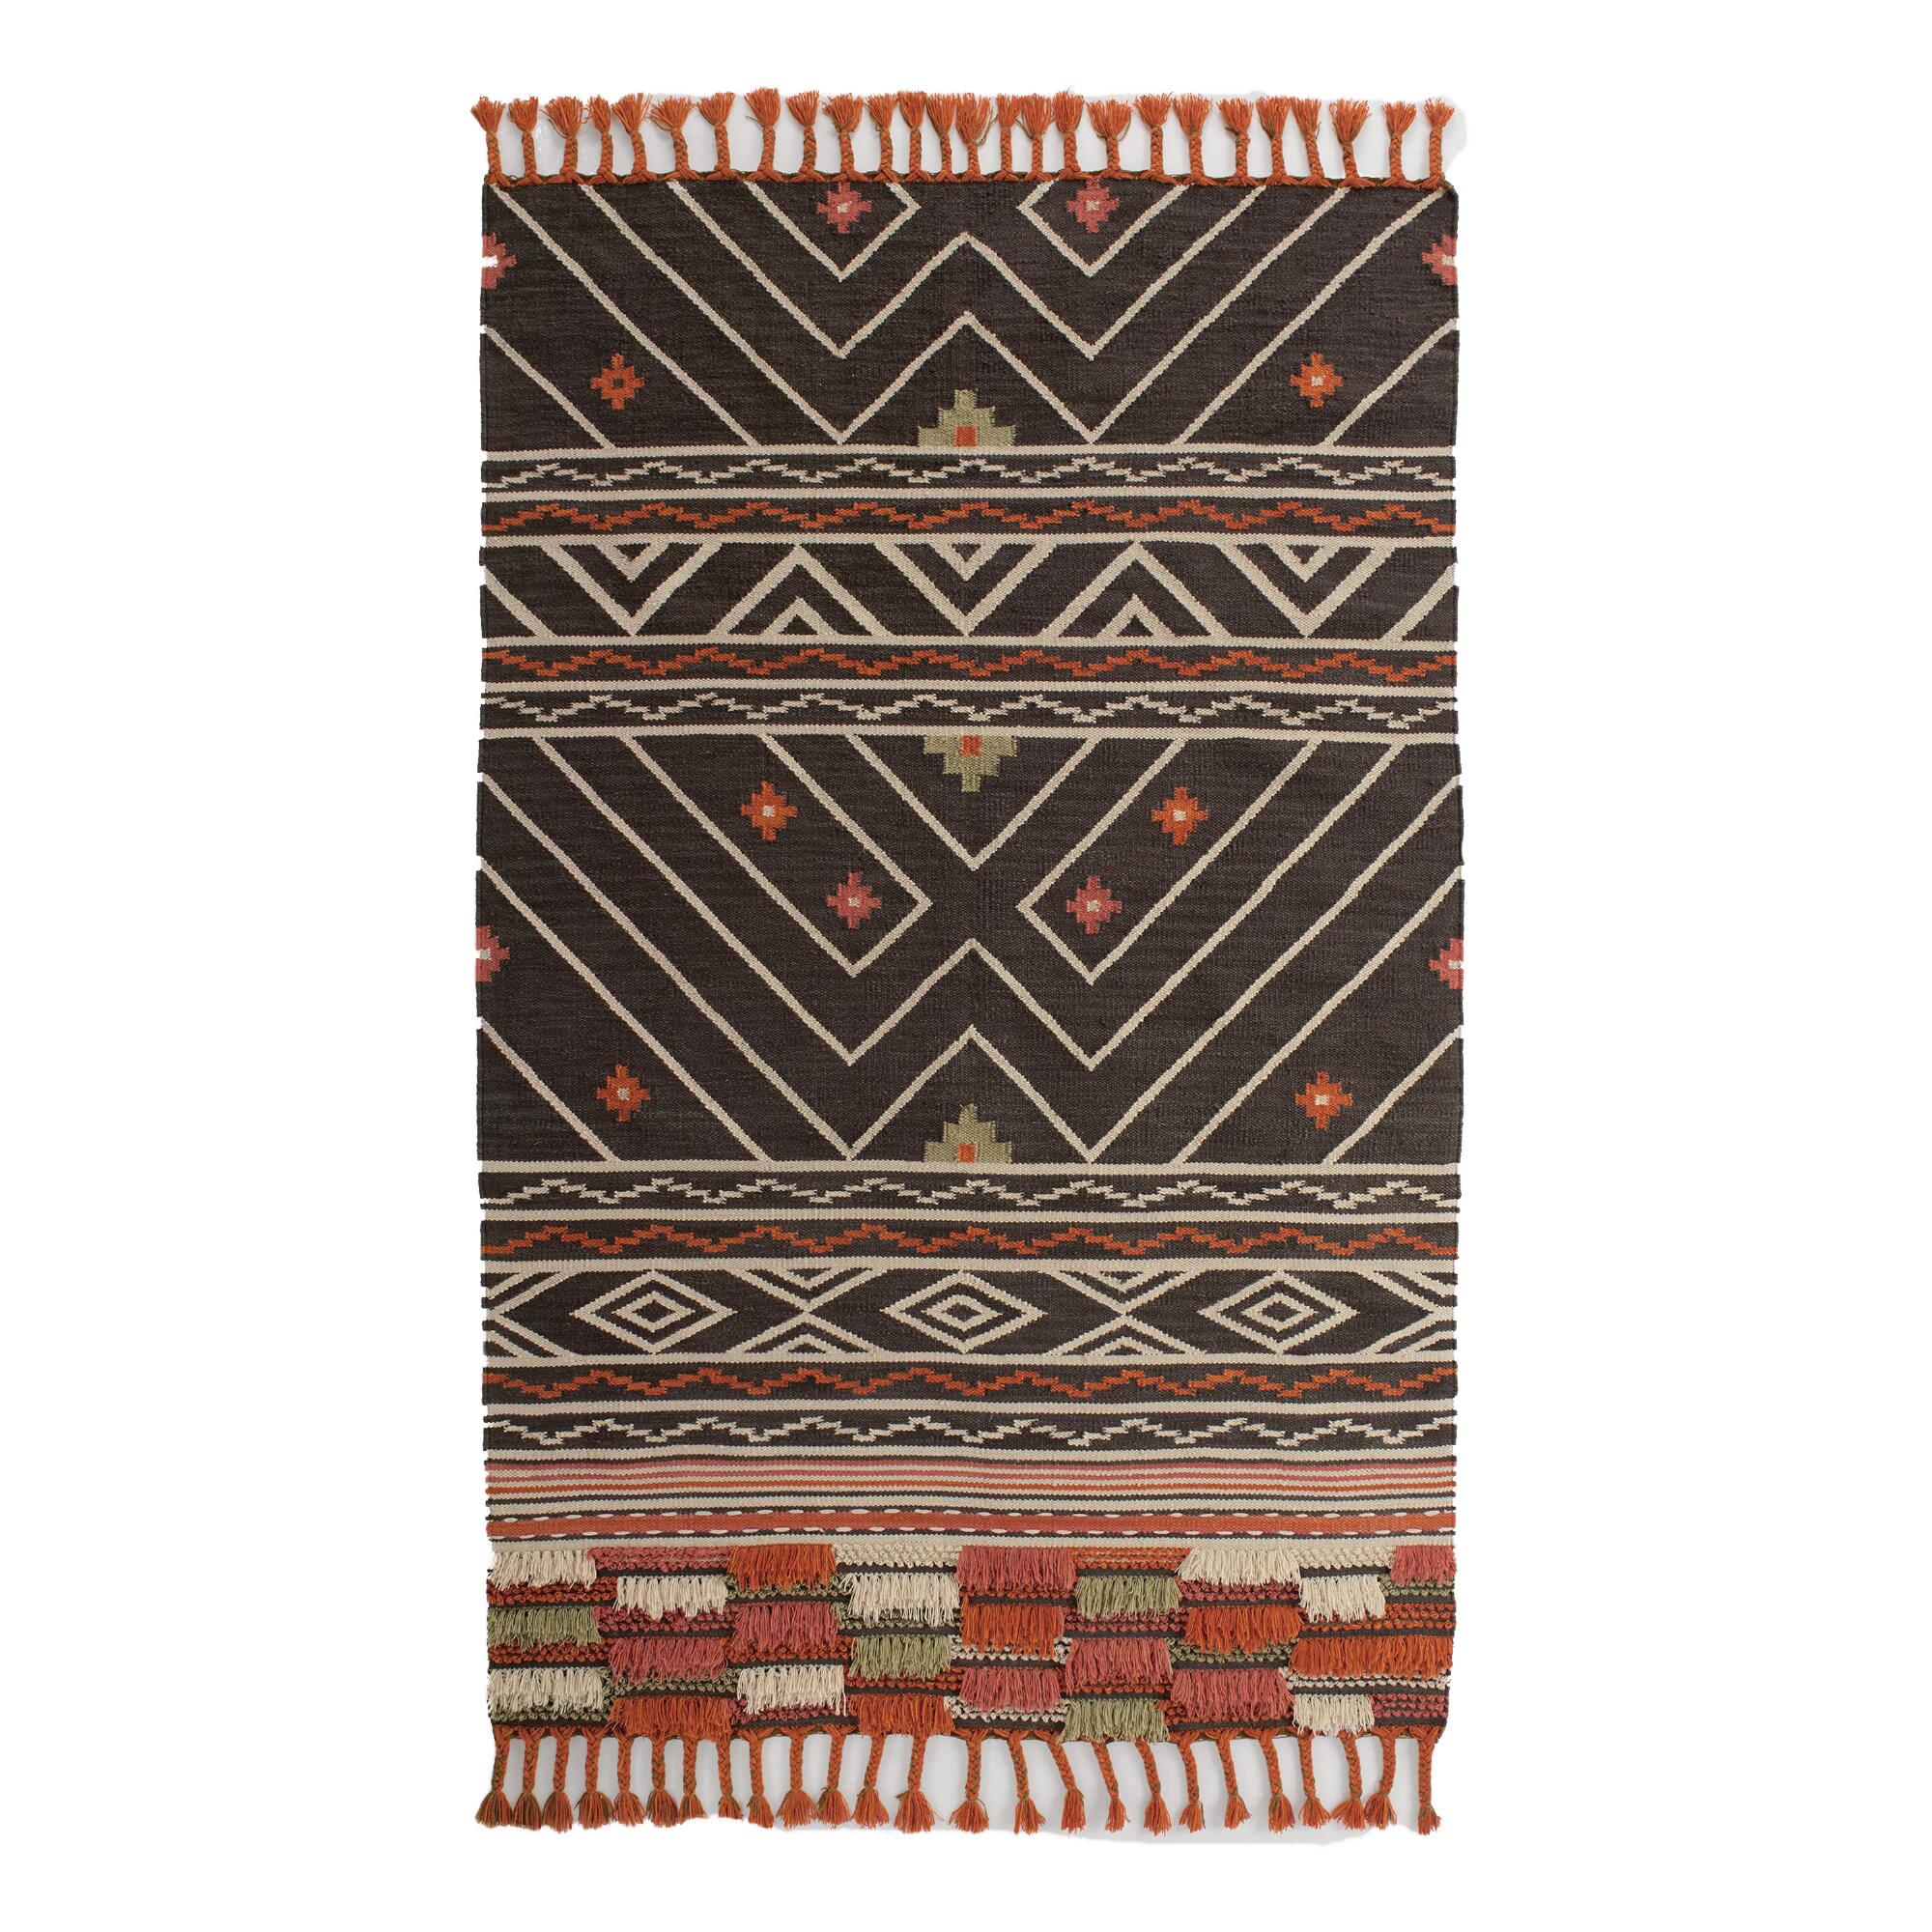 Red-rug-world-market-2.jpg